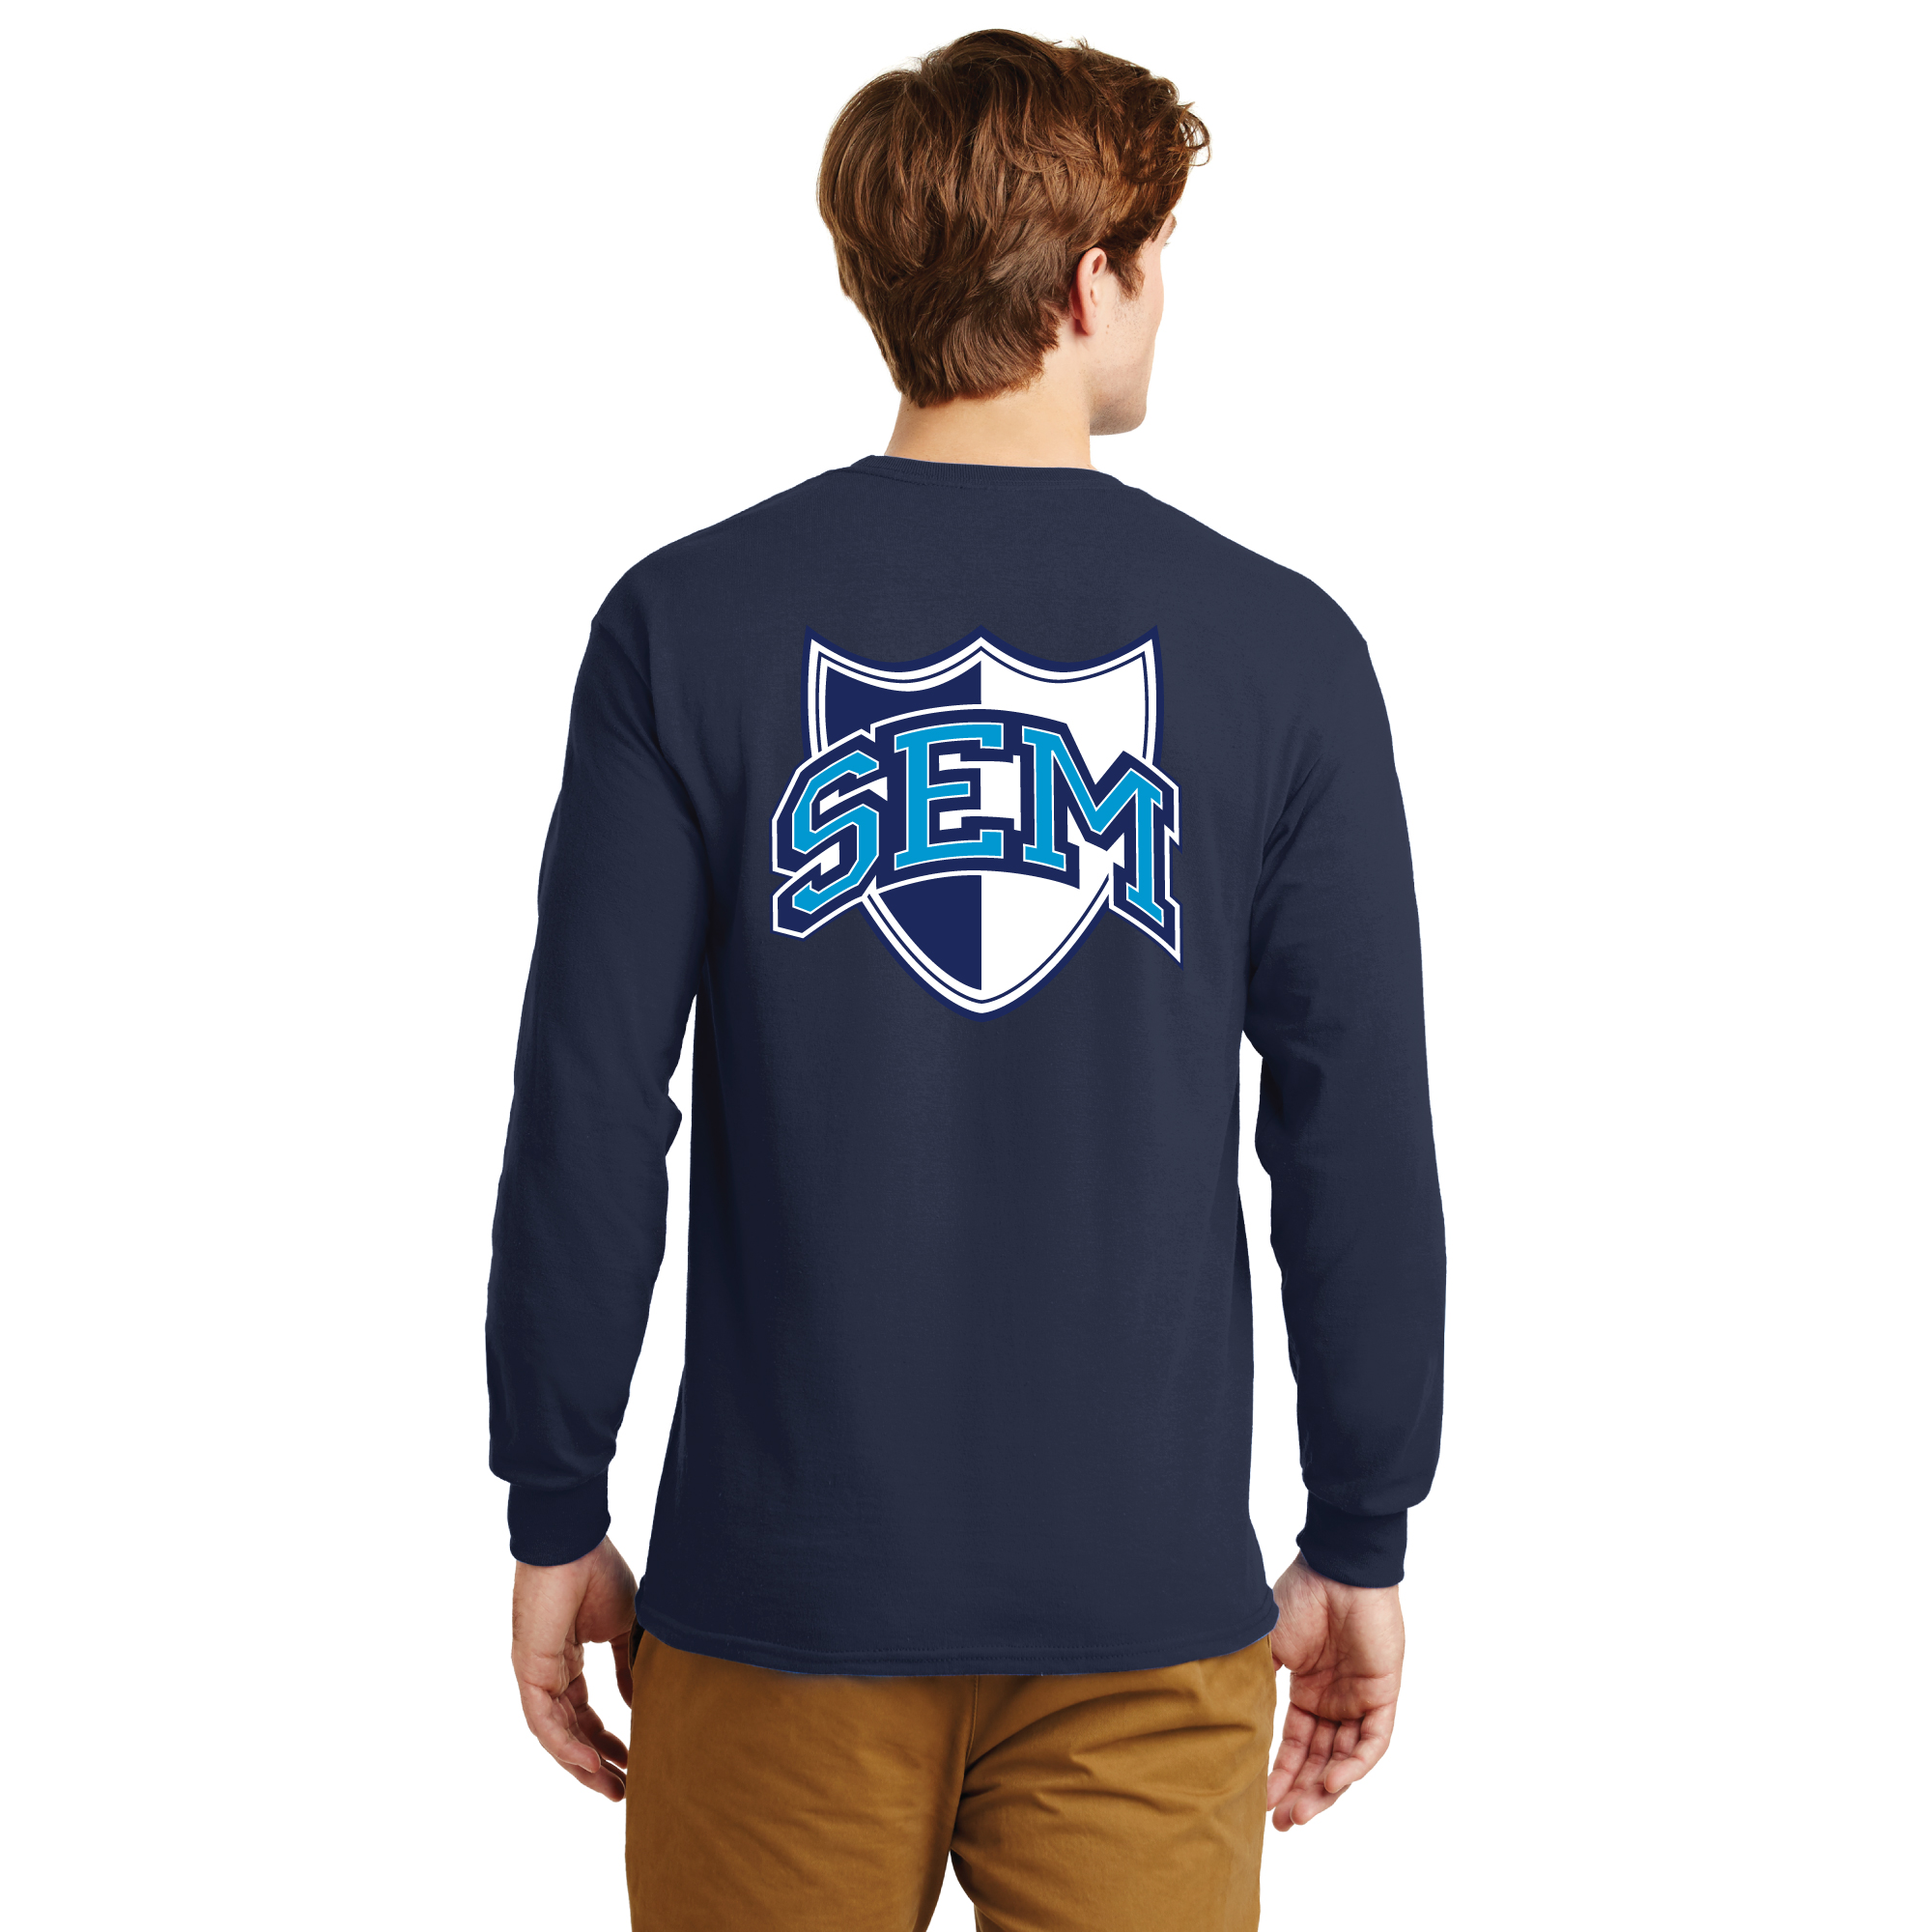 c23490ad7 Wyoming Seminary Navy 100% Cotton Long Sleeve T Shirt